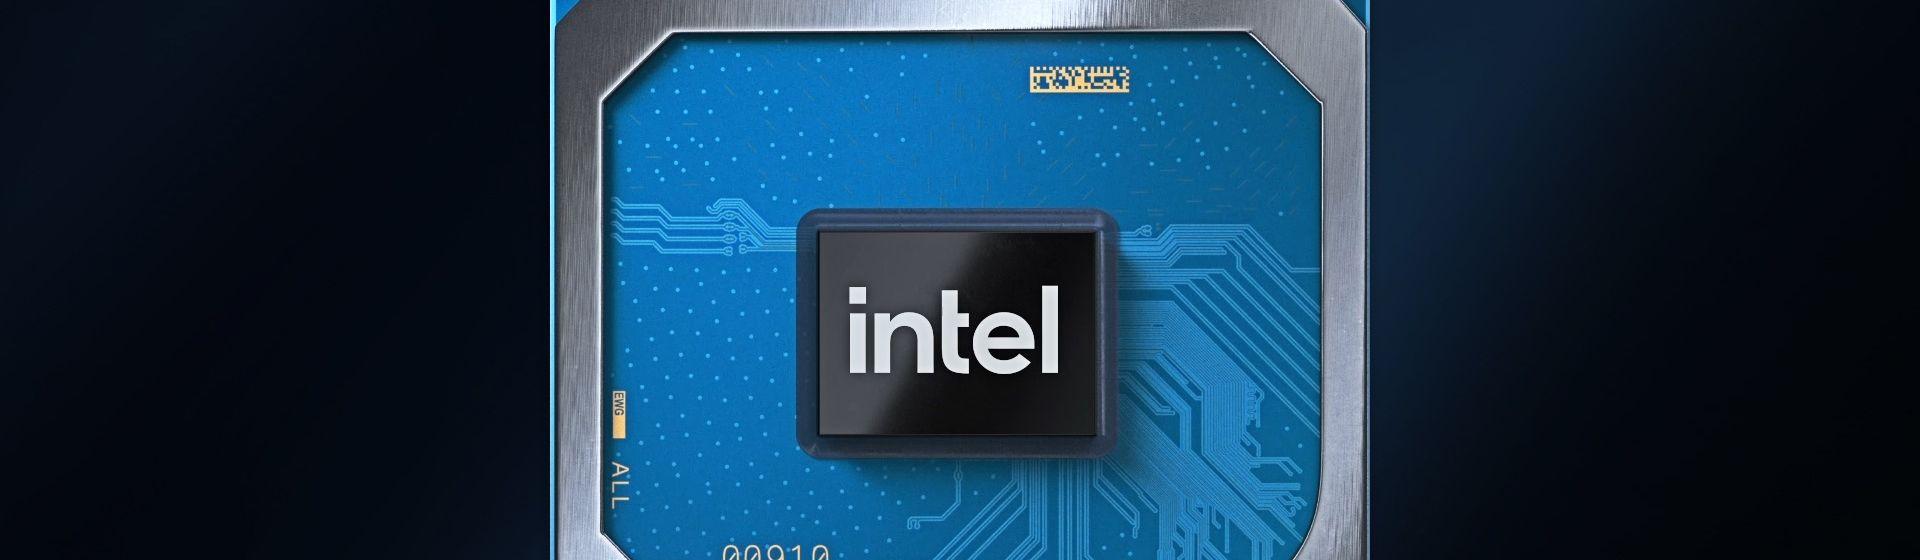 Intel apresenta placa de vídeo Iris Xe Max para notebooks